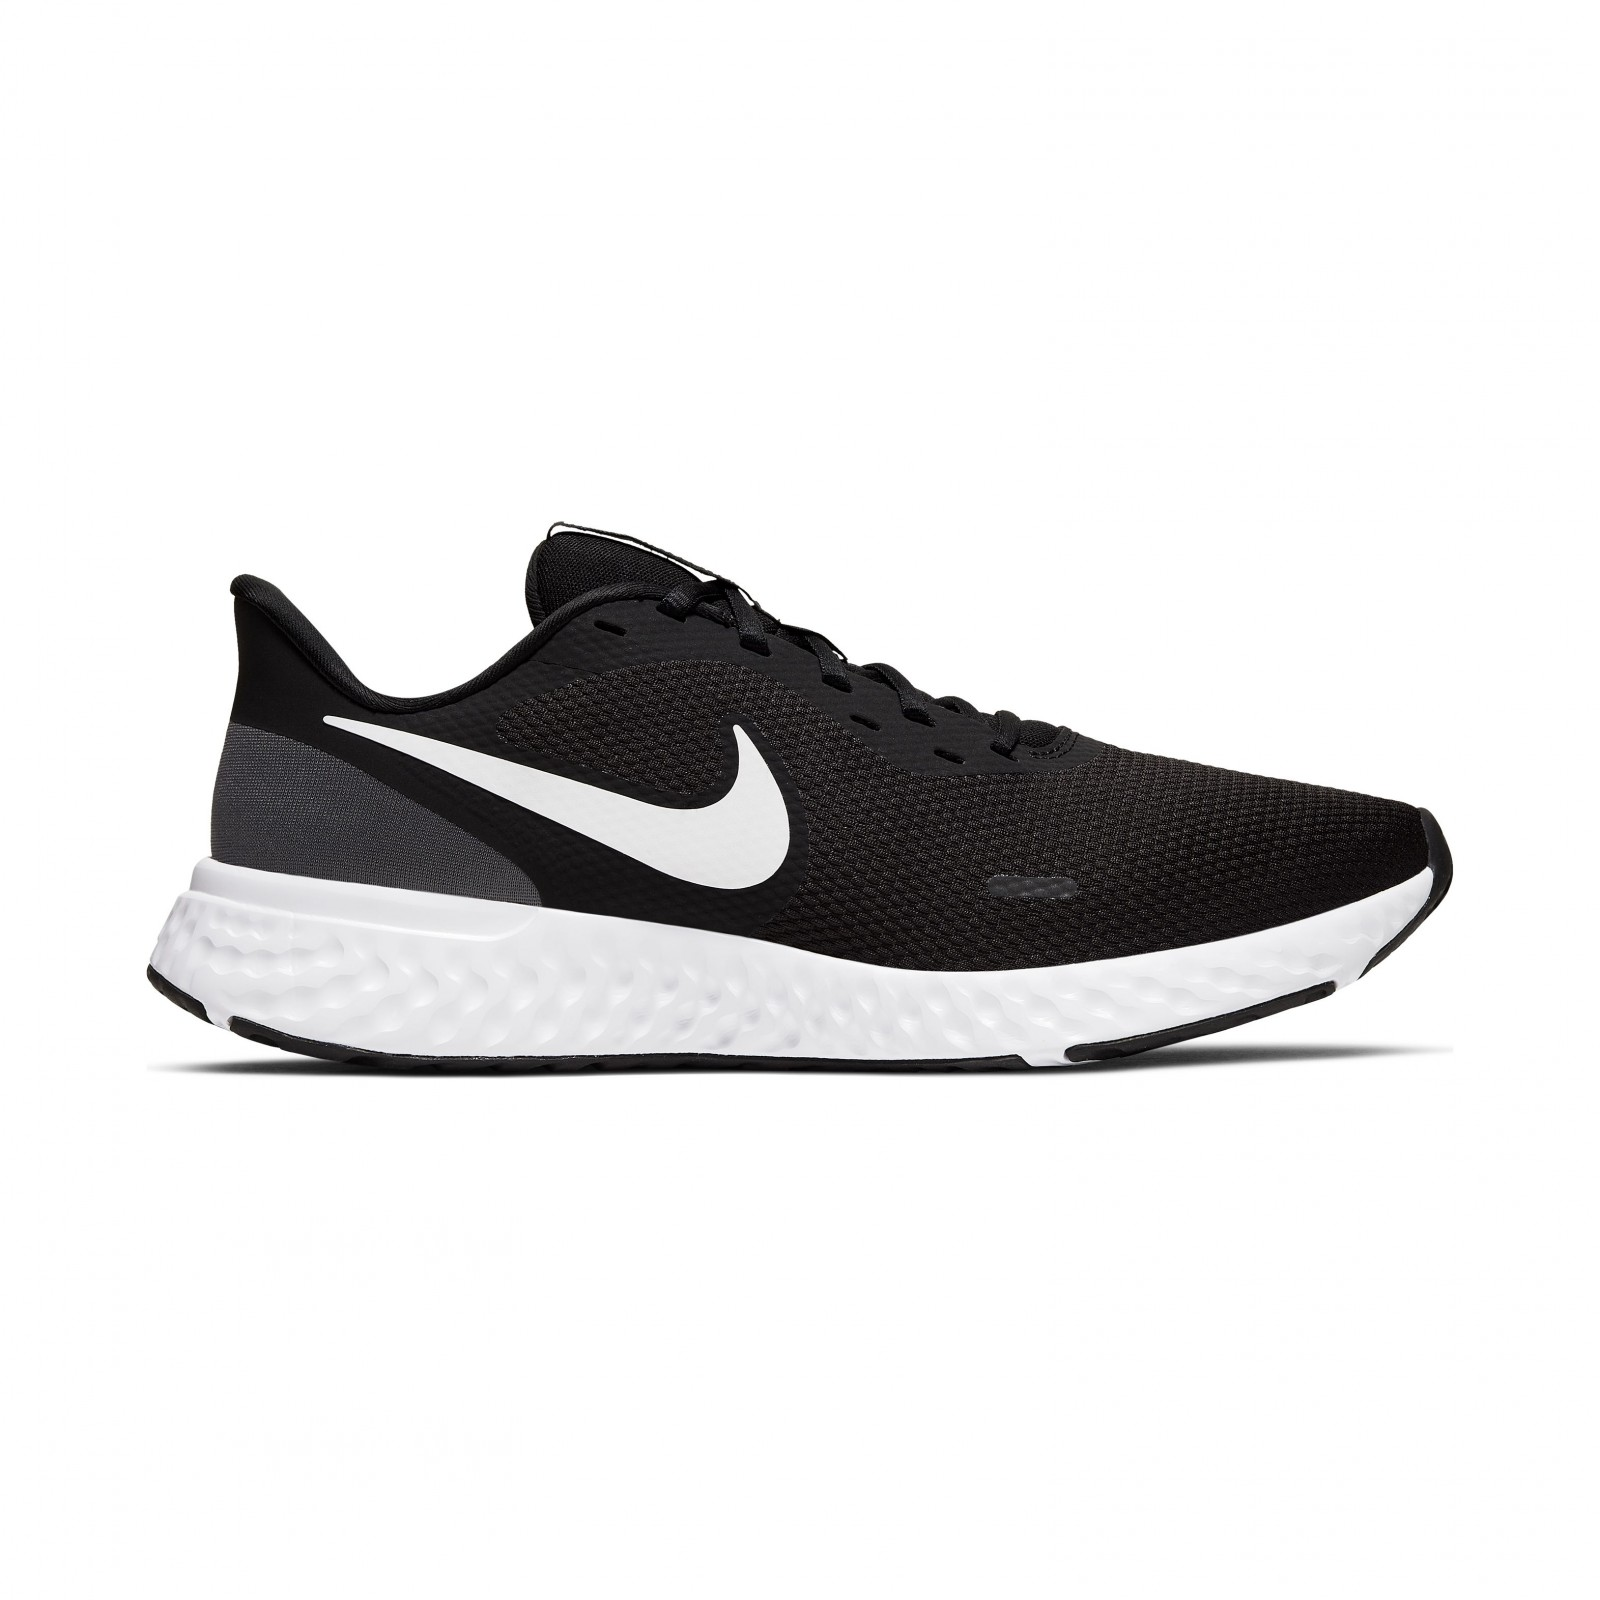 Nike revolution 5 BLACK/WHITE-ANTHRACITE